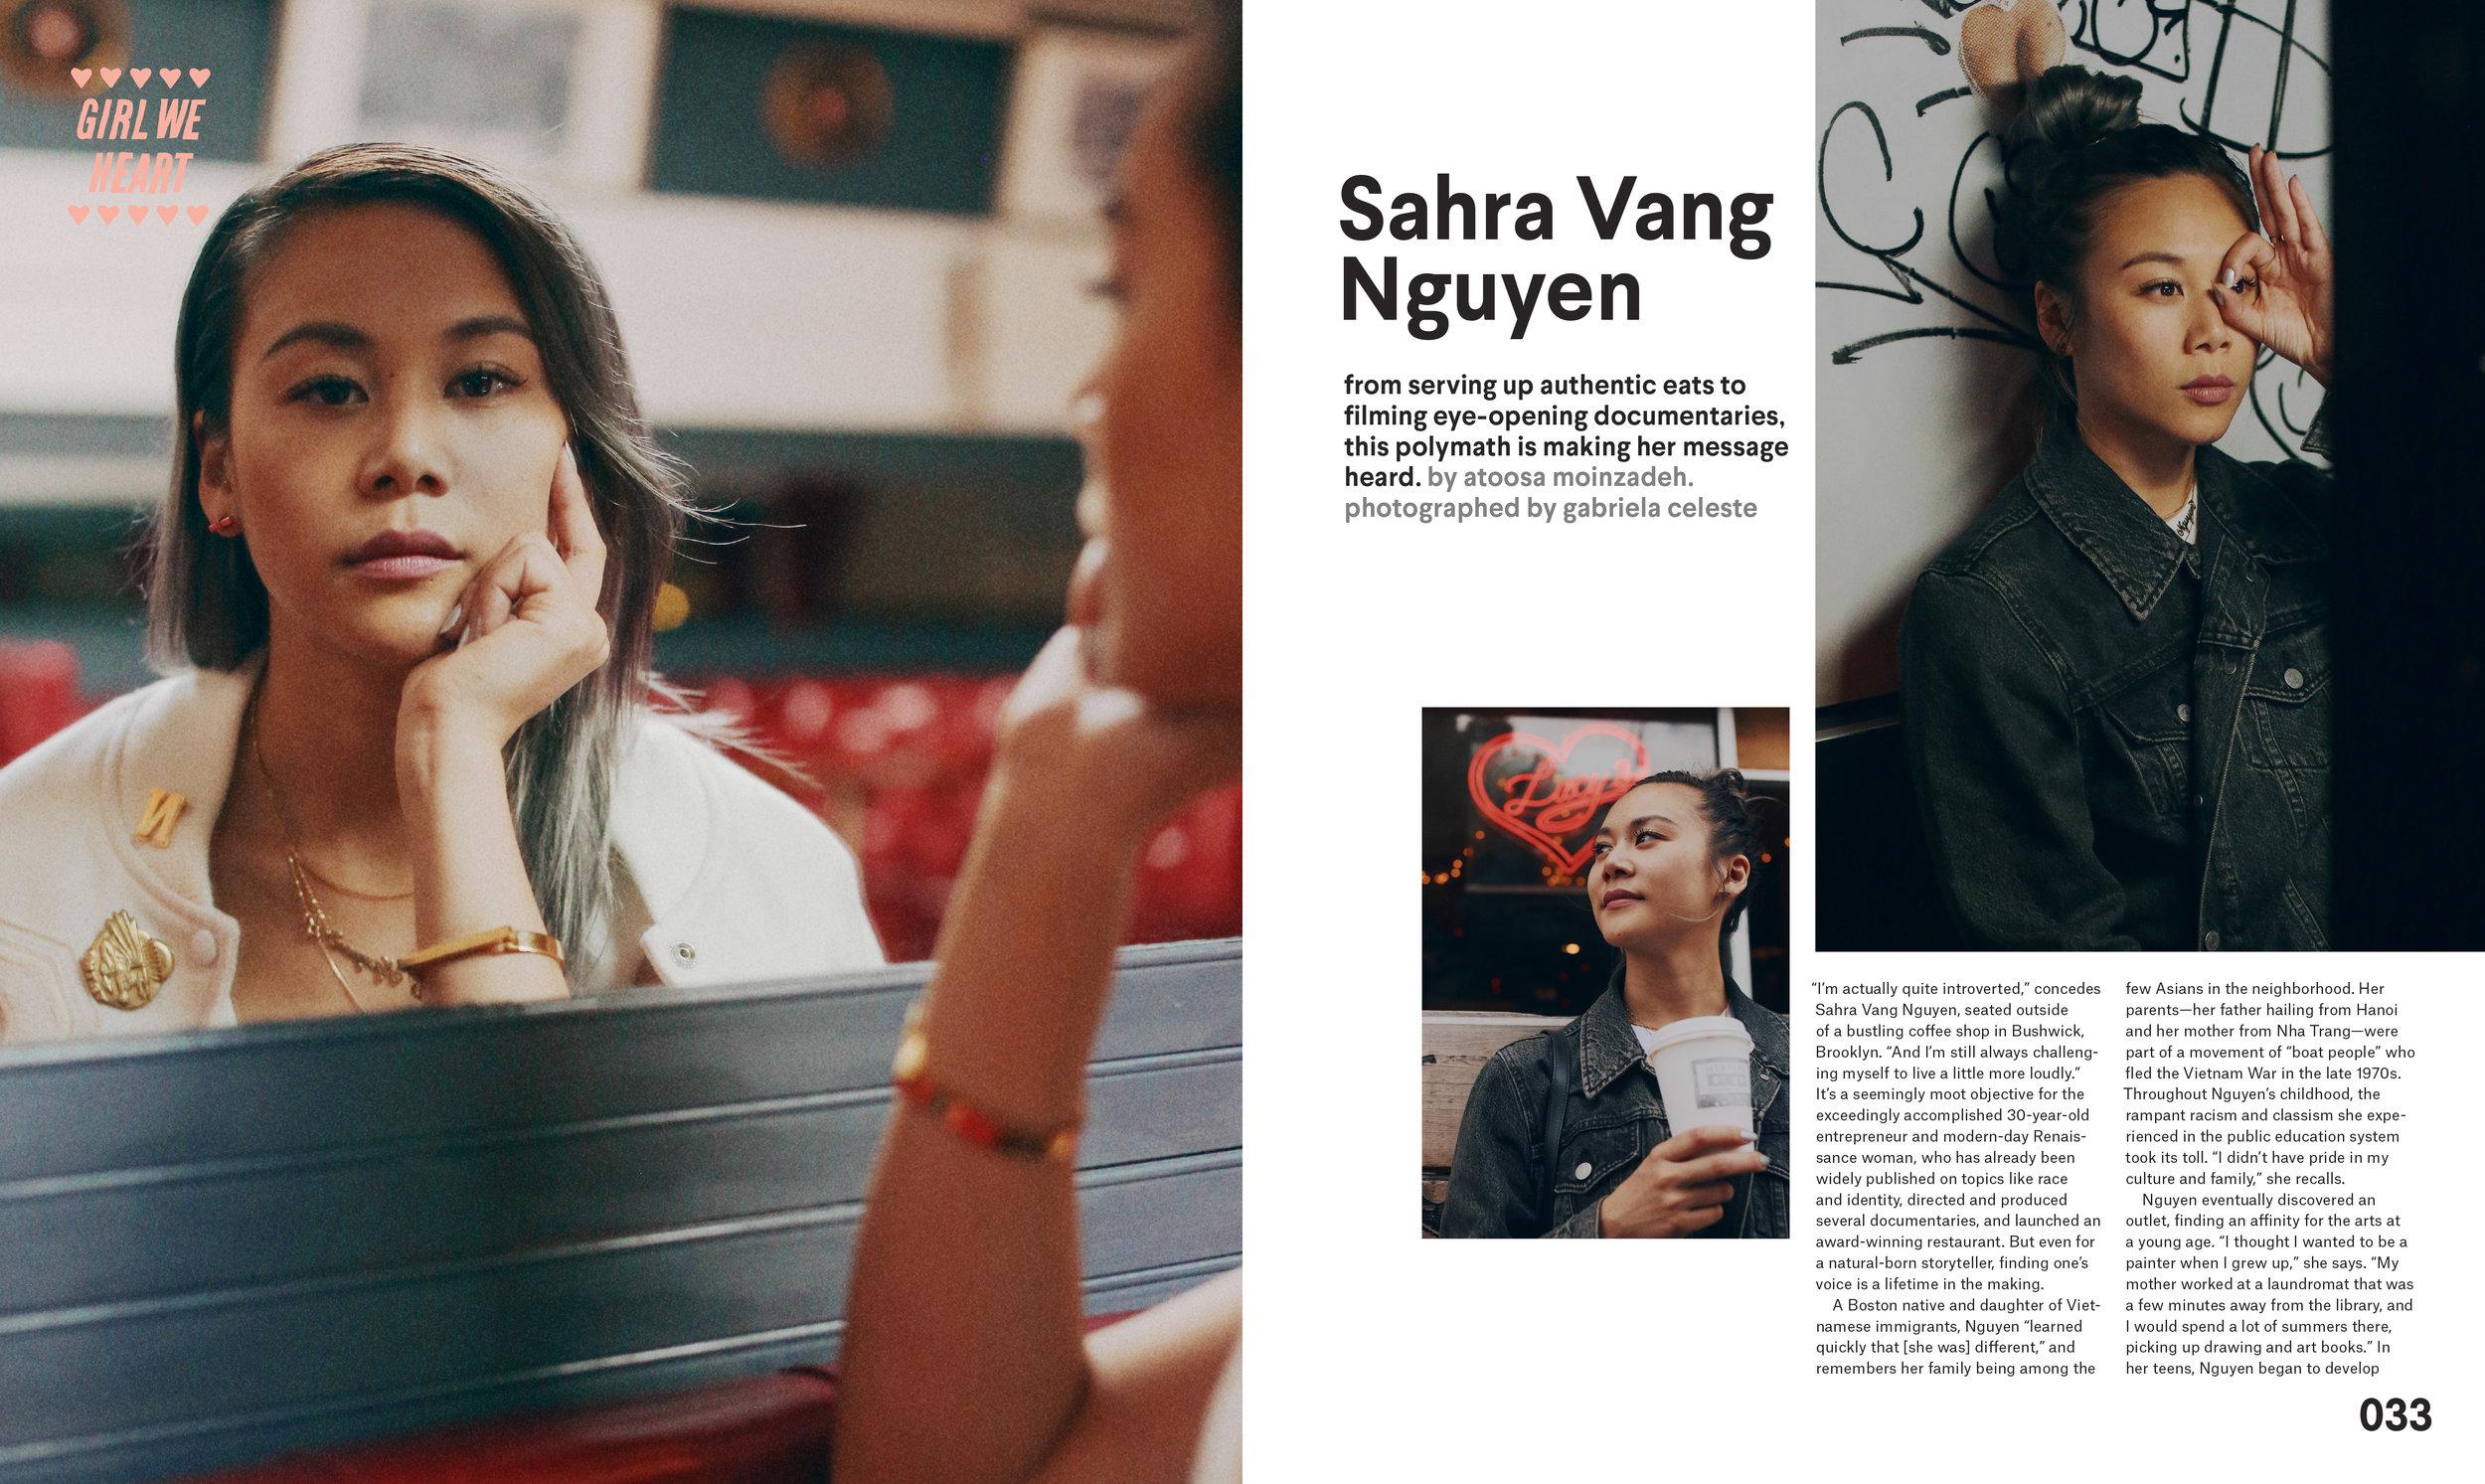 vietnamese american asian american director producer content creator filmmaker entrepreneur renaissance